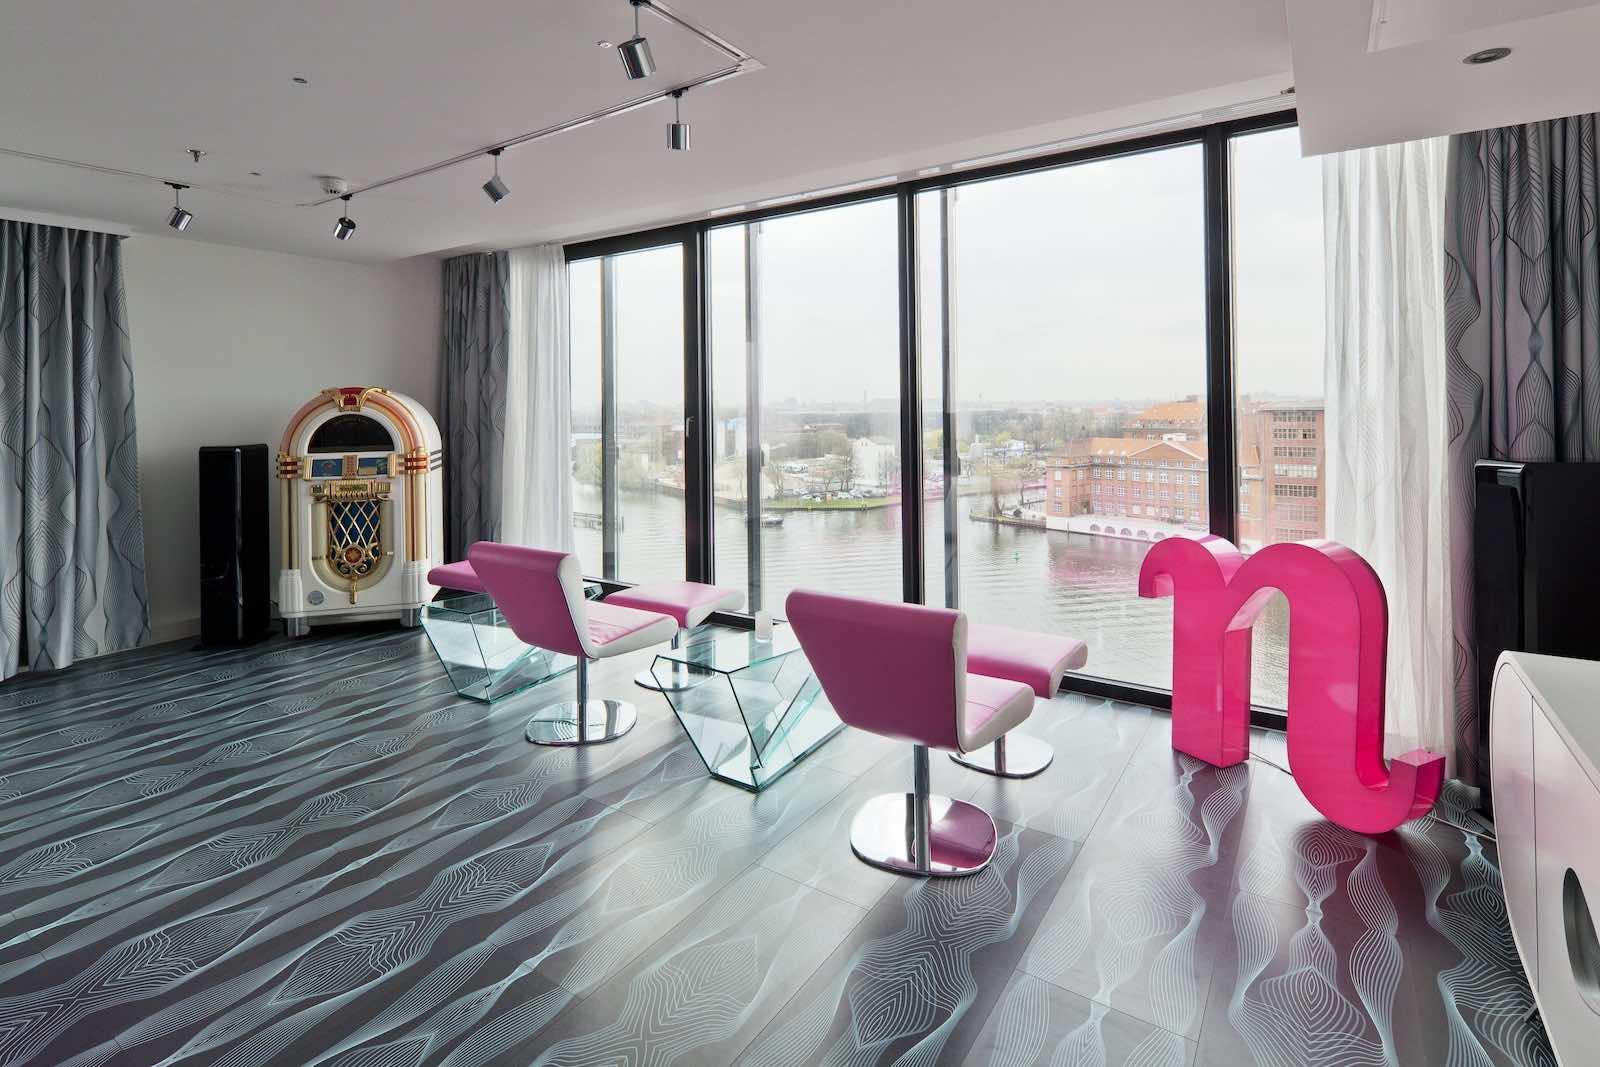 nhow_berlin- pink chairs juke box and river views